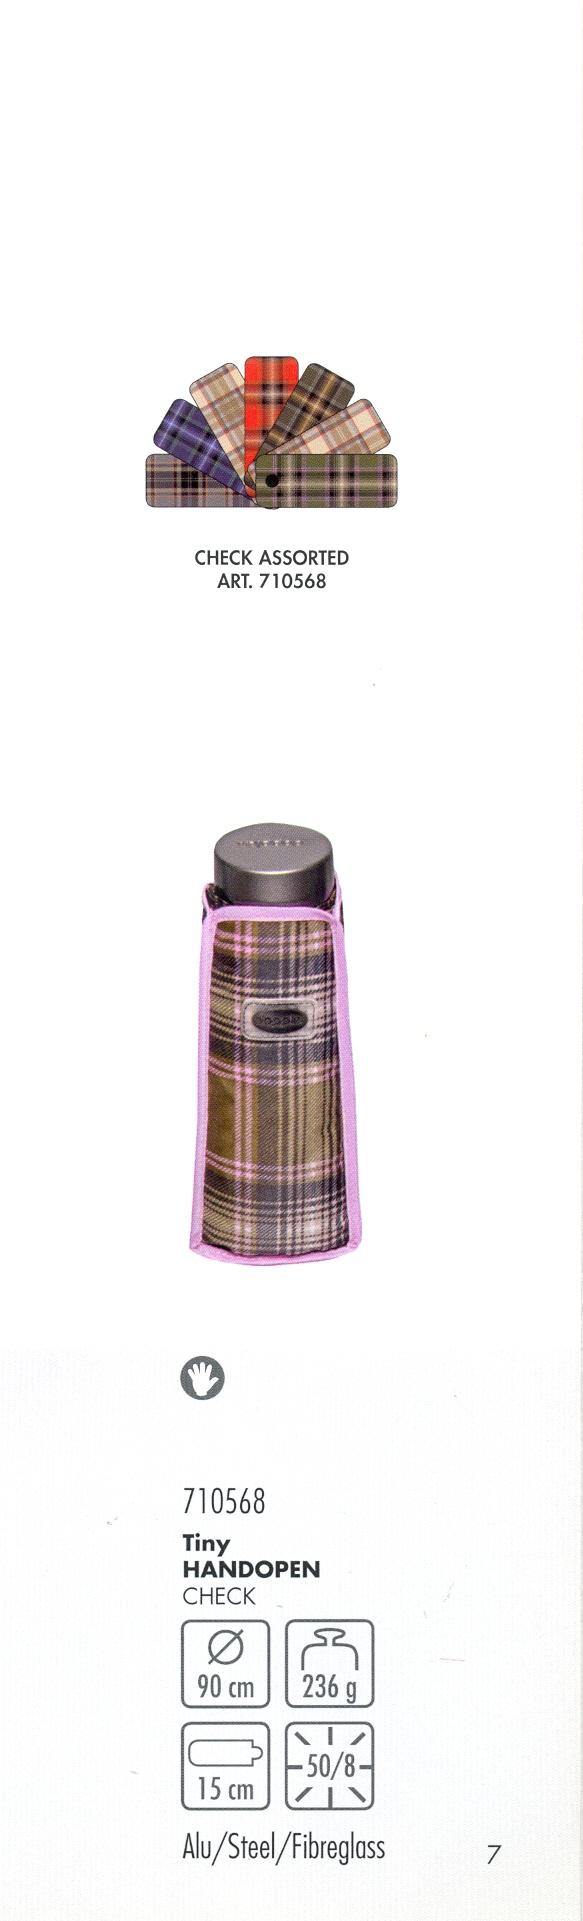 710568 tiny manuel de seulement 15 cm de long dessins écossais assortis